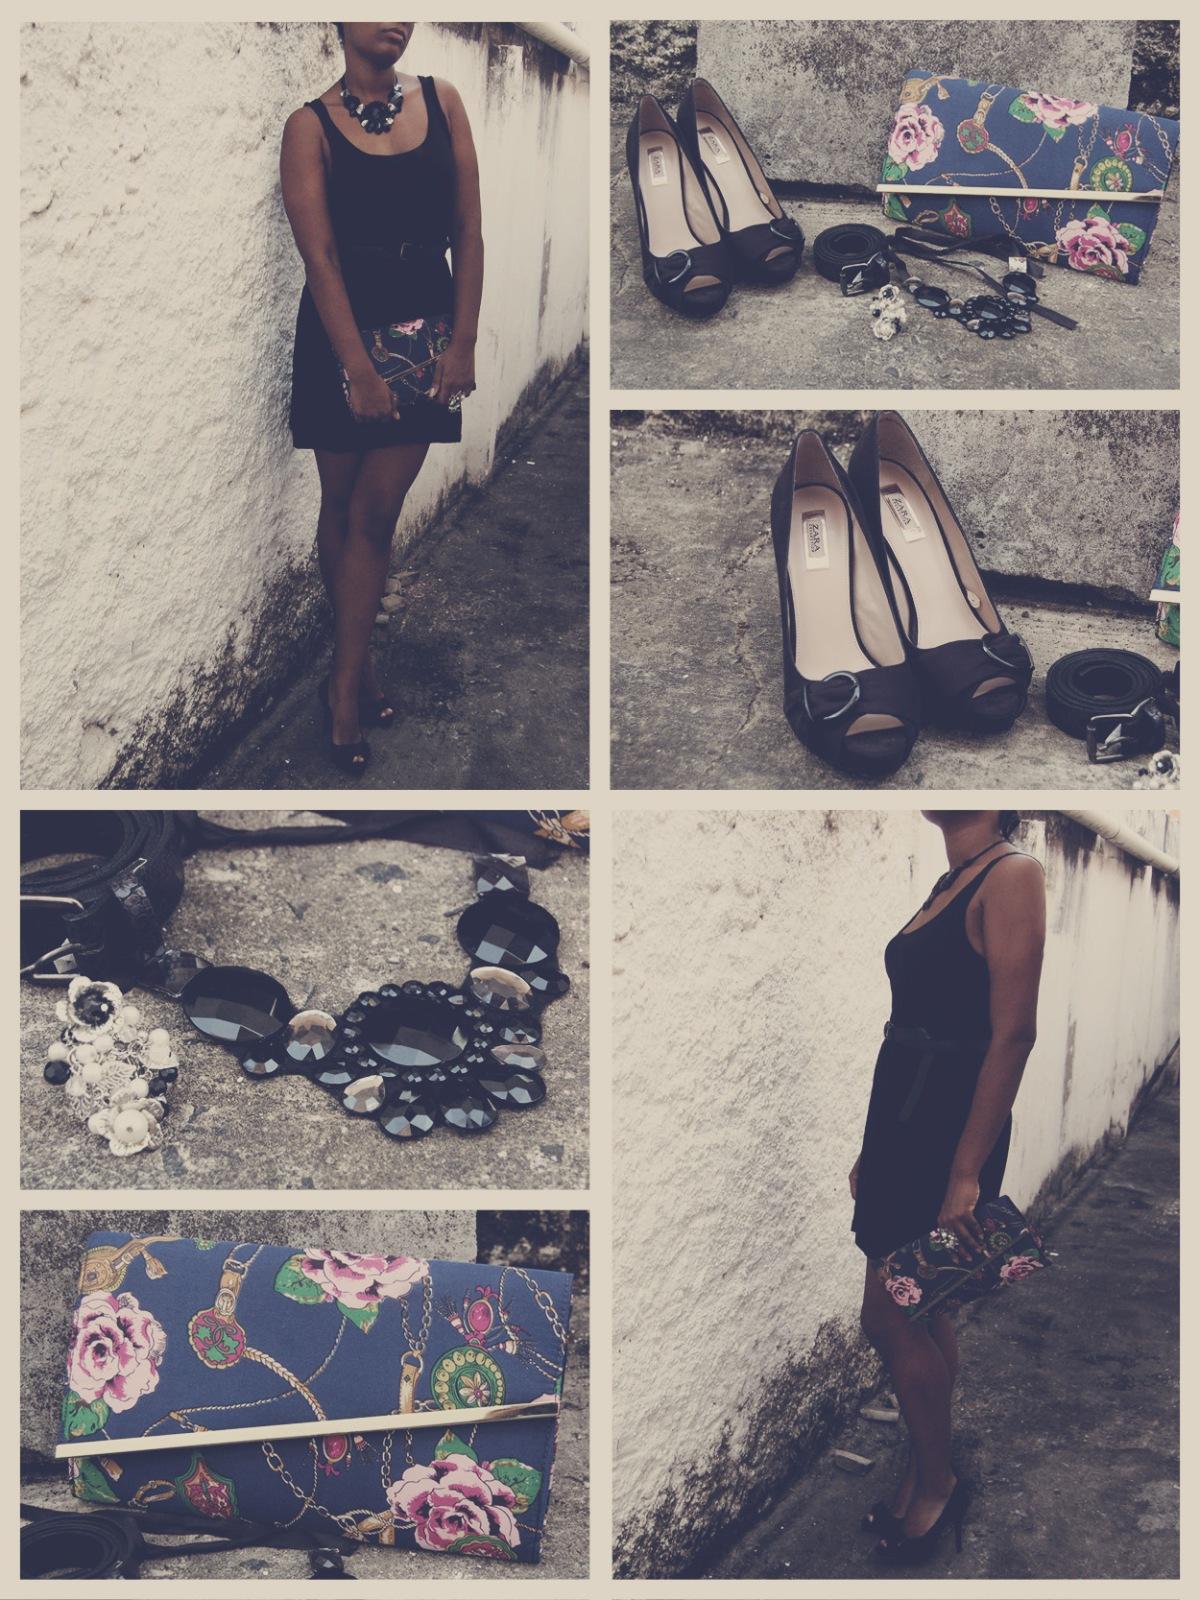 Necklace, archive; Peep toes, Zara; Ring, H&M; Belt, Renner; Clutch, ASOS || Colar, Arquivo pessoal; Peep toe, Zara; Anel, H&M; Cinto, Renner; Clutch, Renner